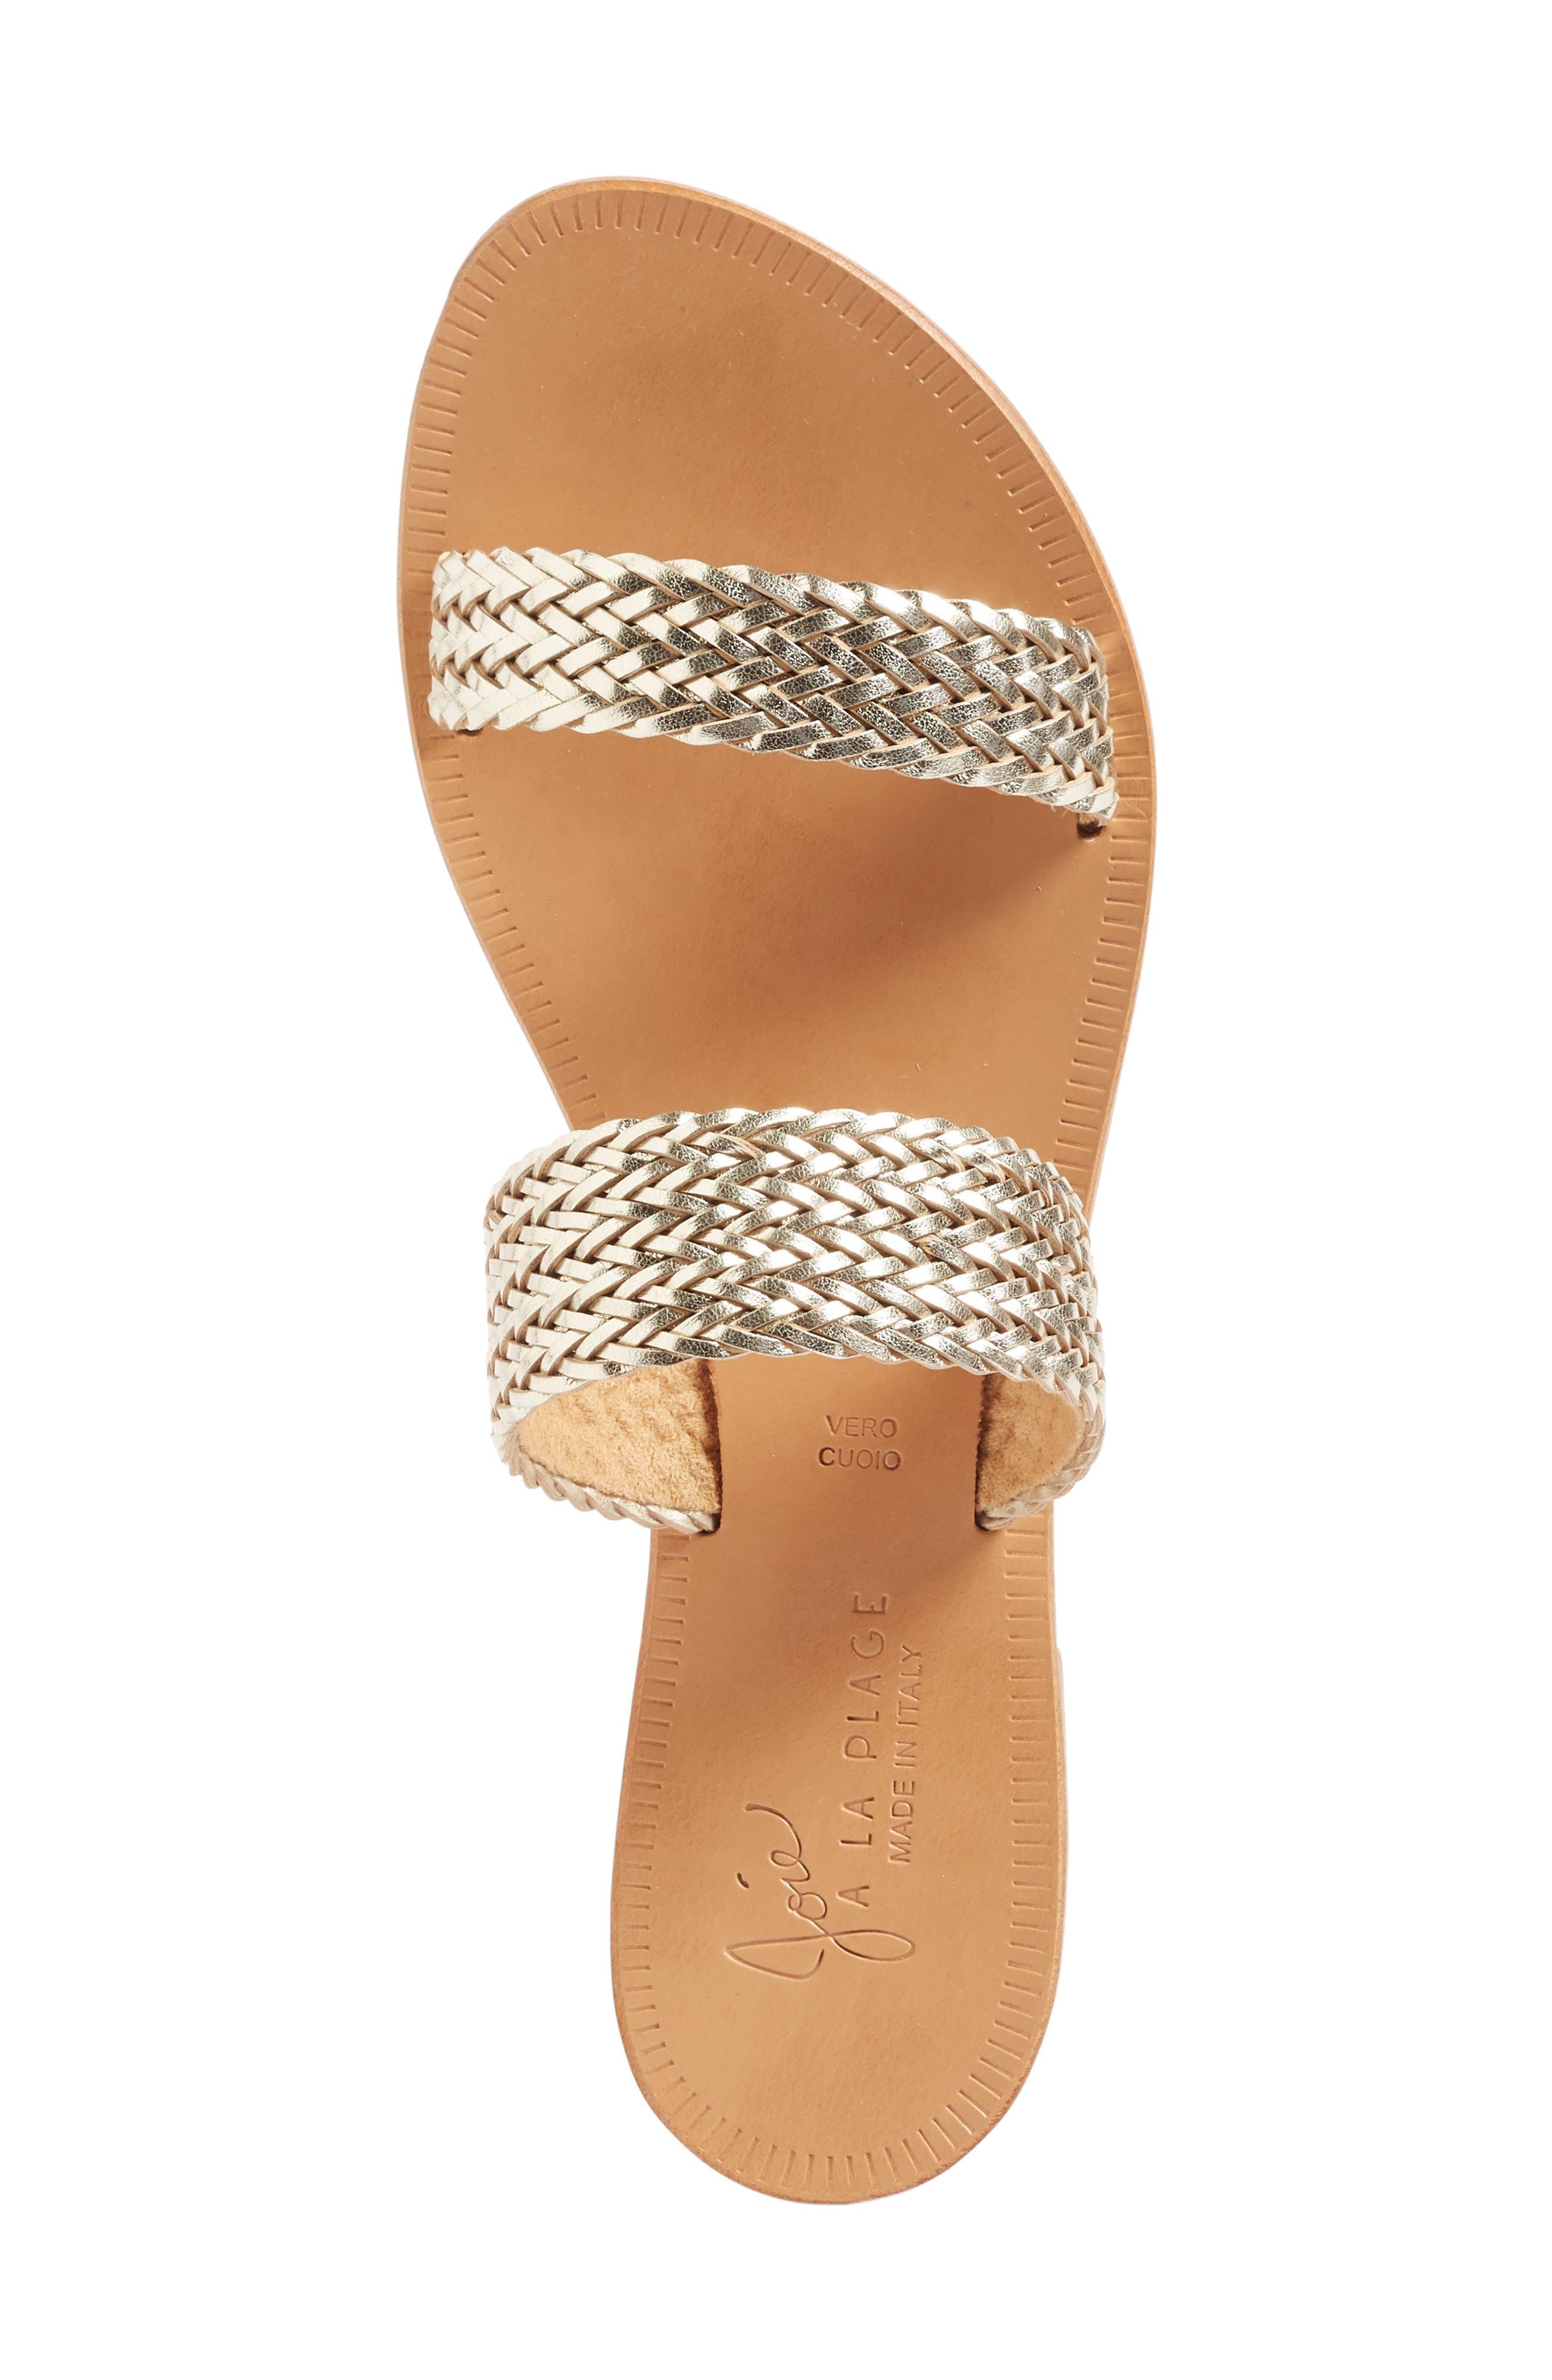 Alternate Image 3  - Joie a la Plage 'Sable' Leather Slip-On Sandal (Women)